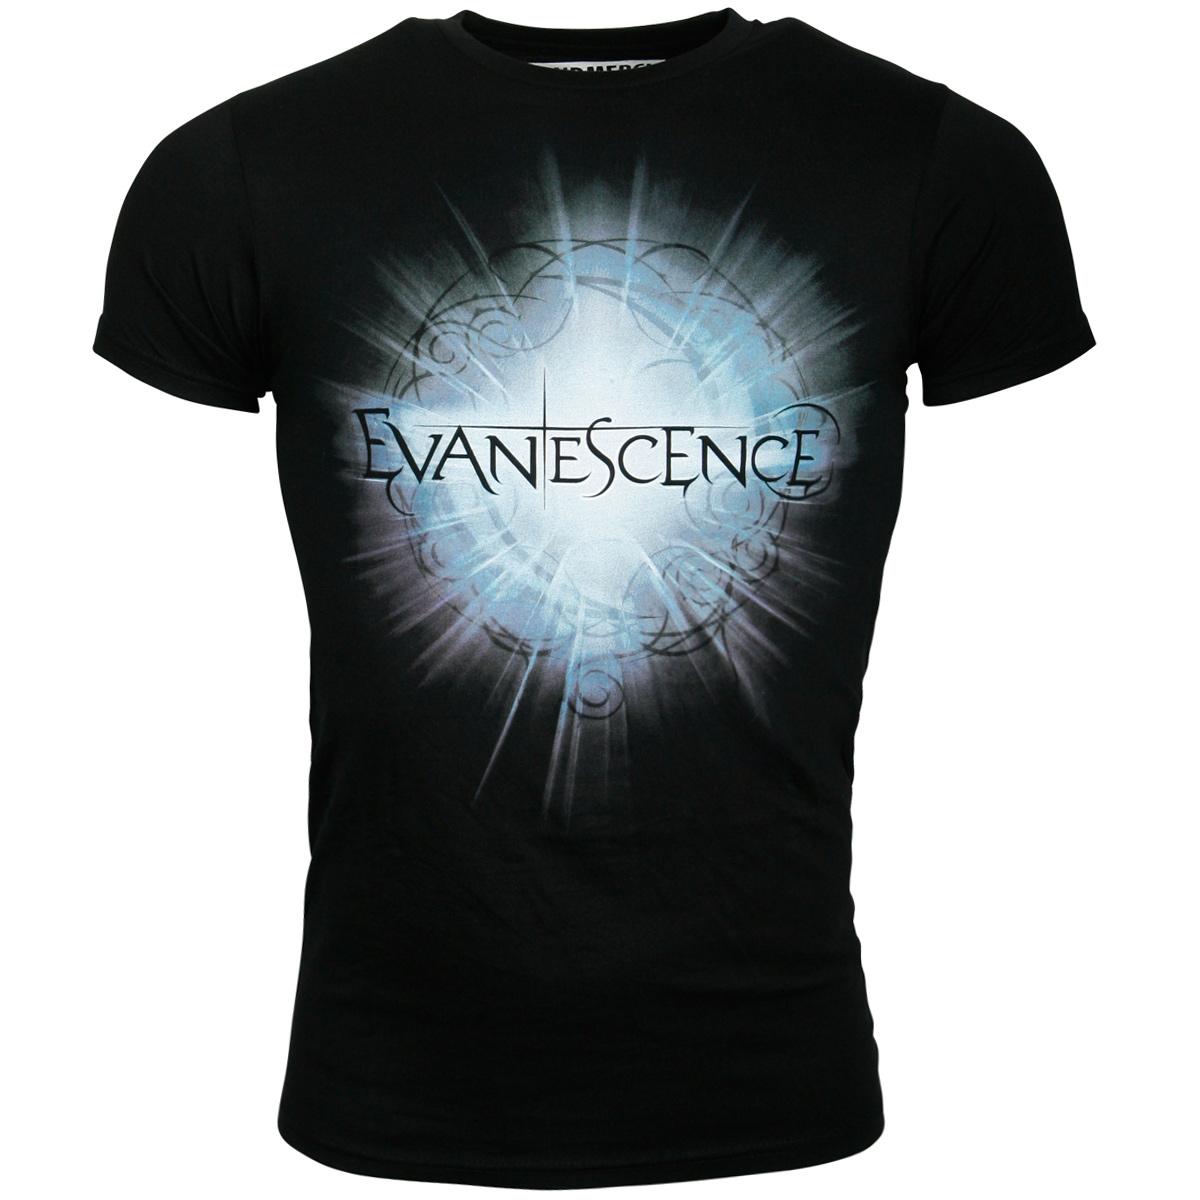 Evanescence - T-Shirt Shine - schwarz